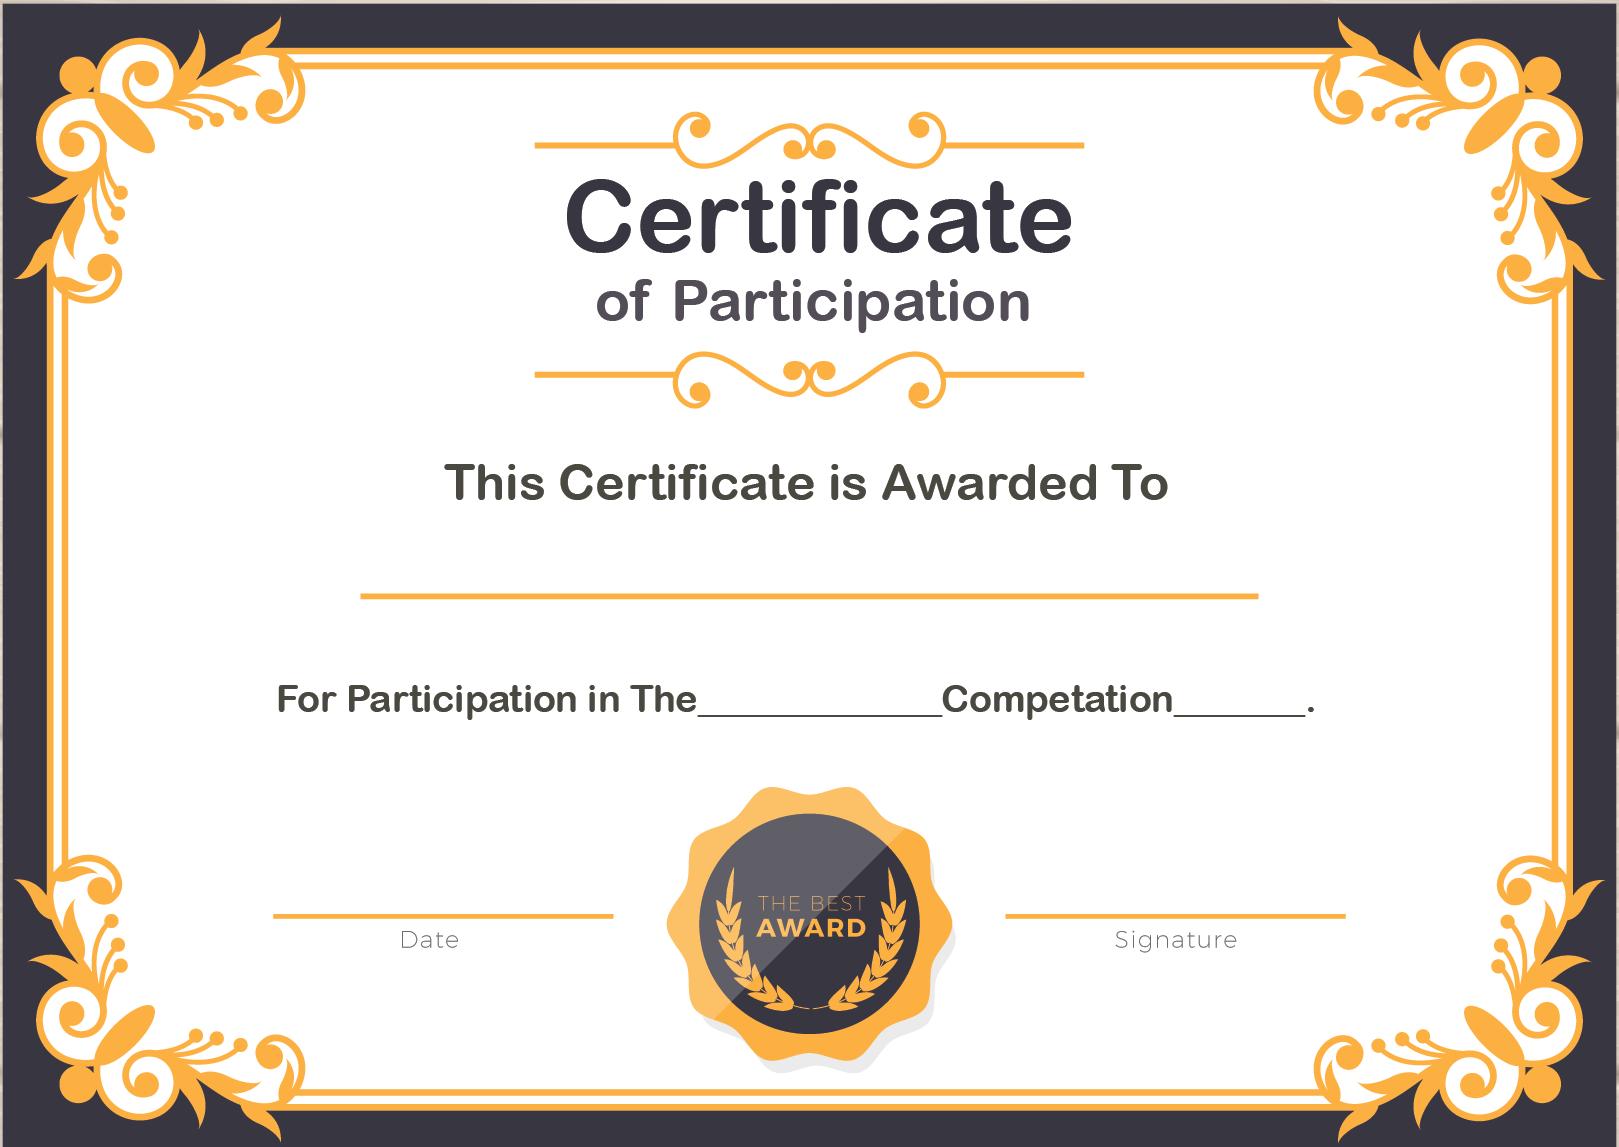 Certification of Participation Format Content